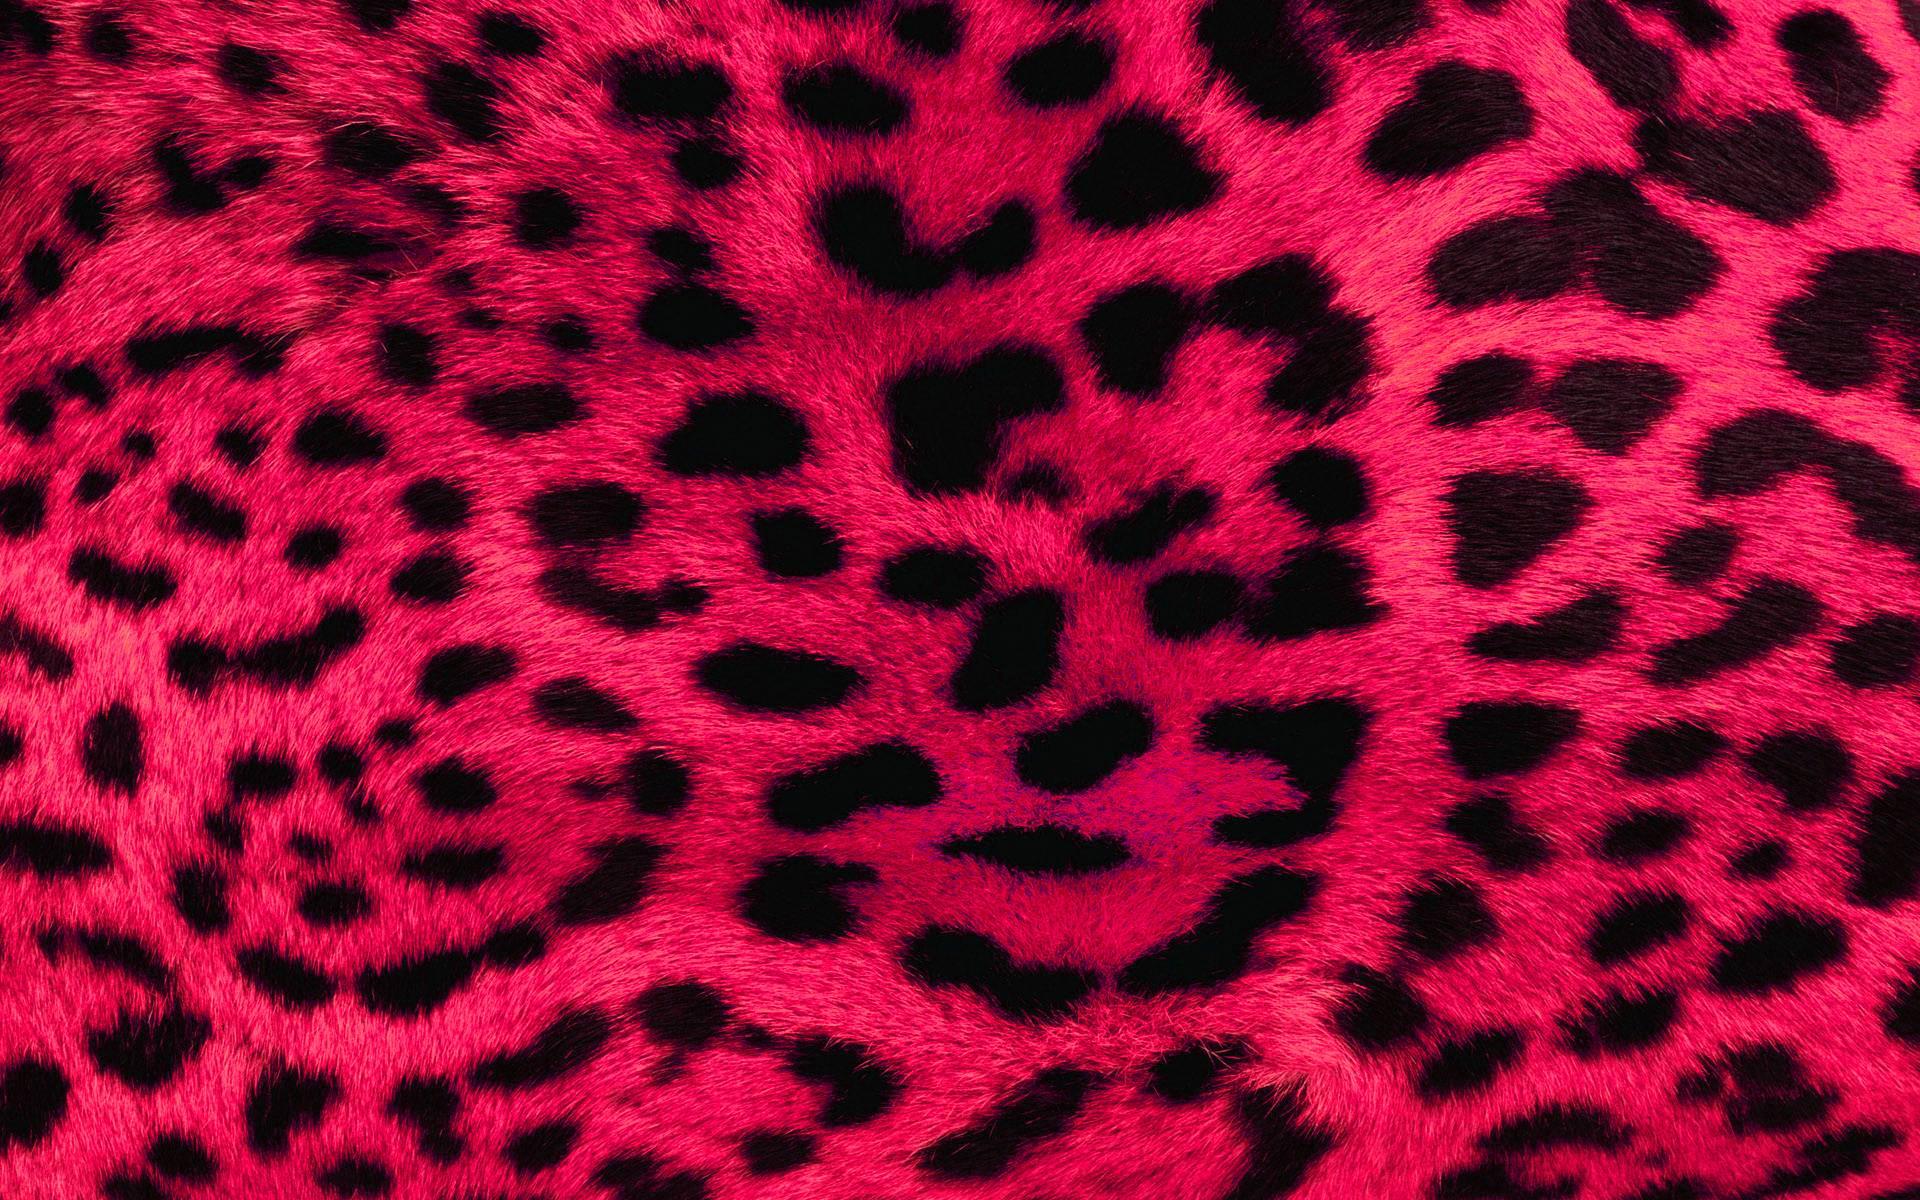 Leopard Print Wallpaper Best Of Full Hd P Neon Wallpapers Desktop Backgrounds X